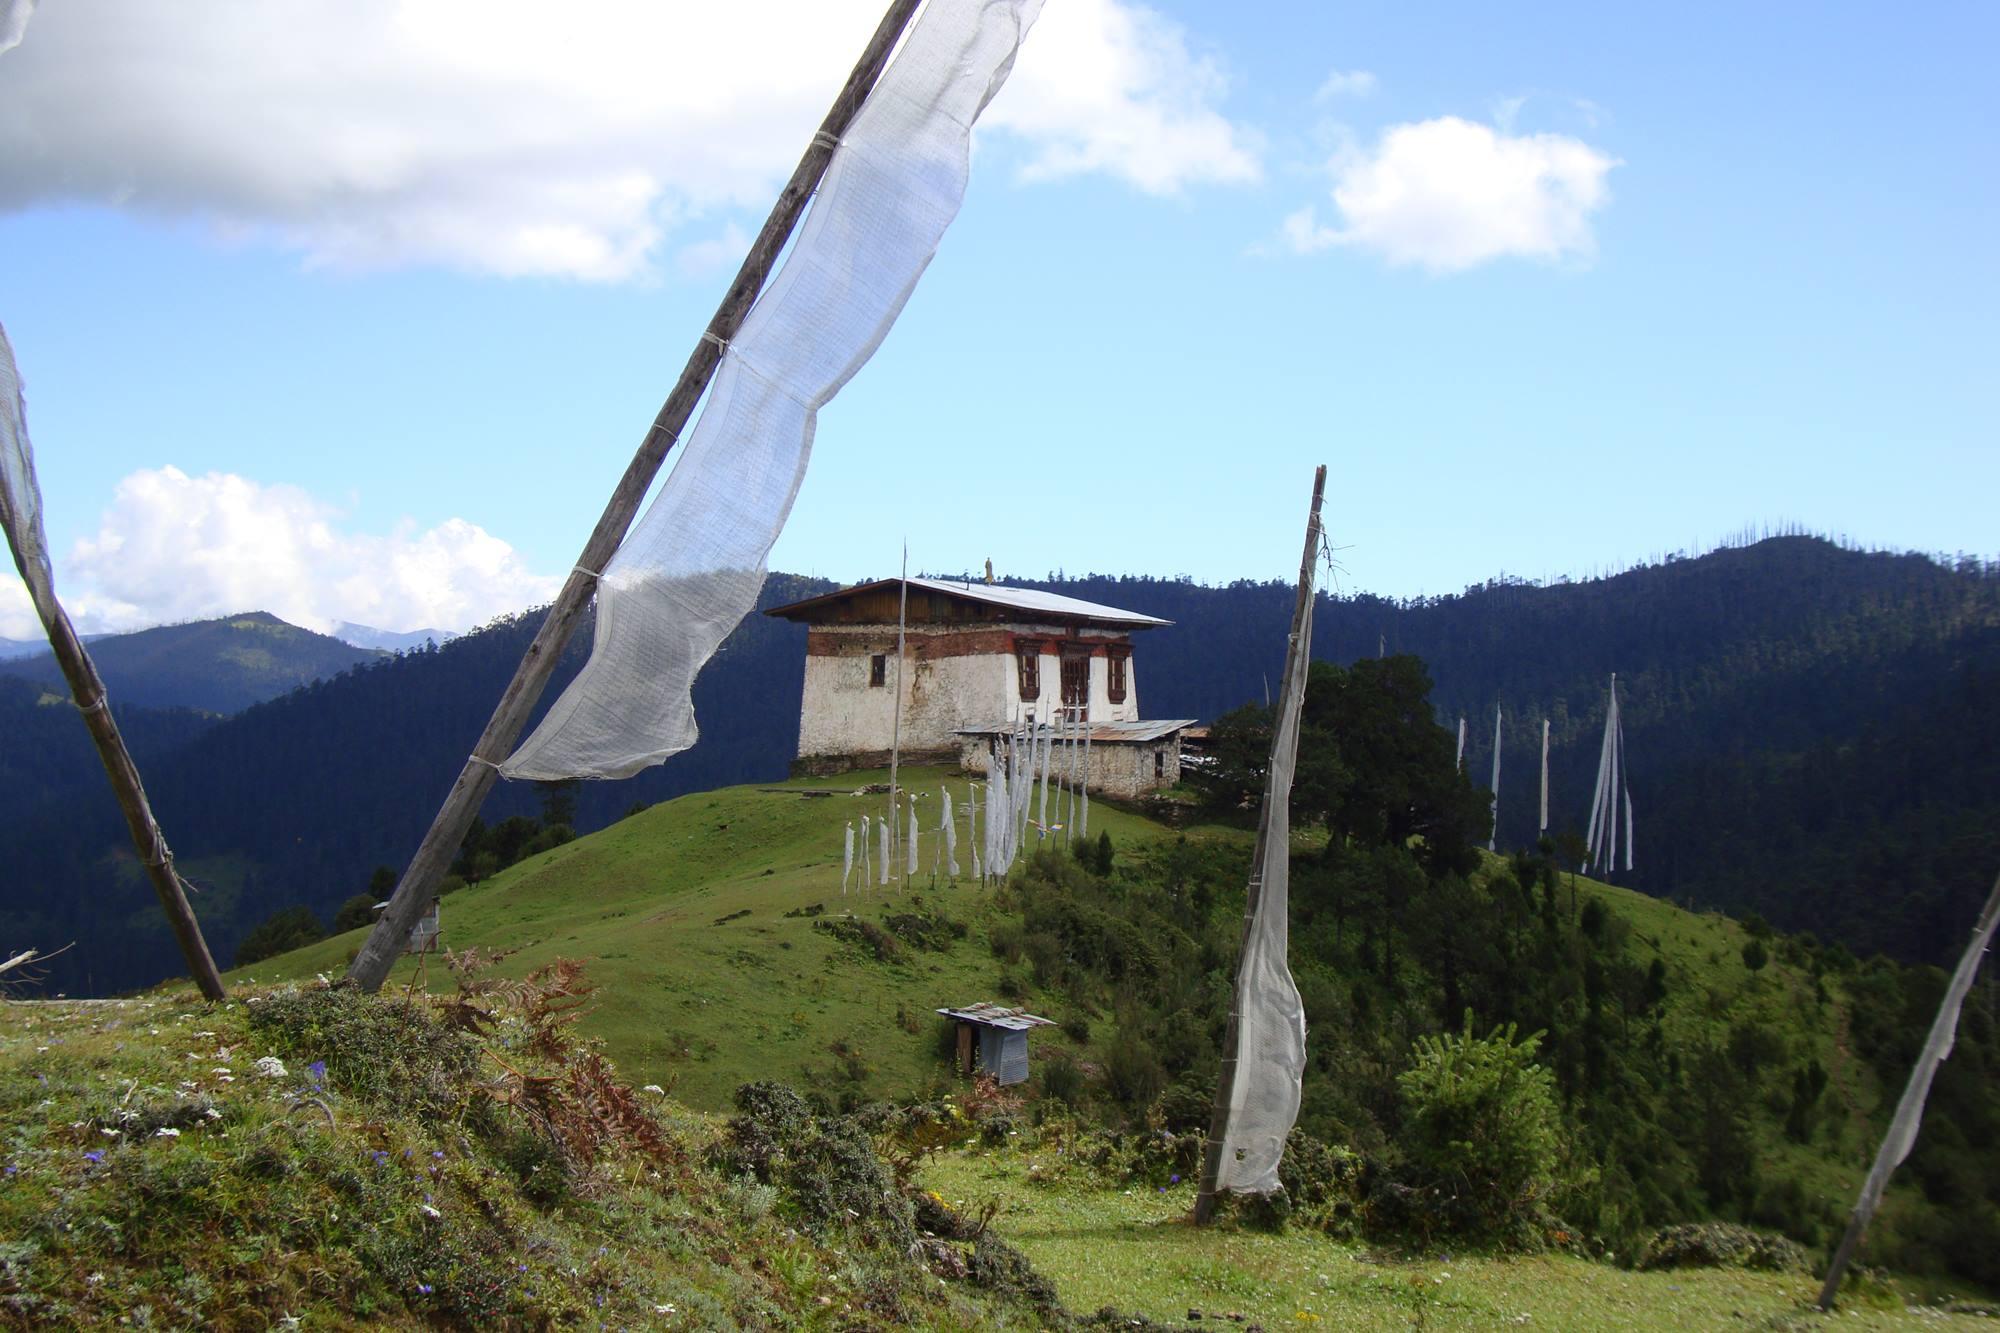 Druk Path Trek Wandern Mit Guide In Bhutan Wainando